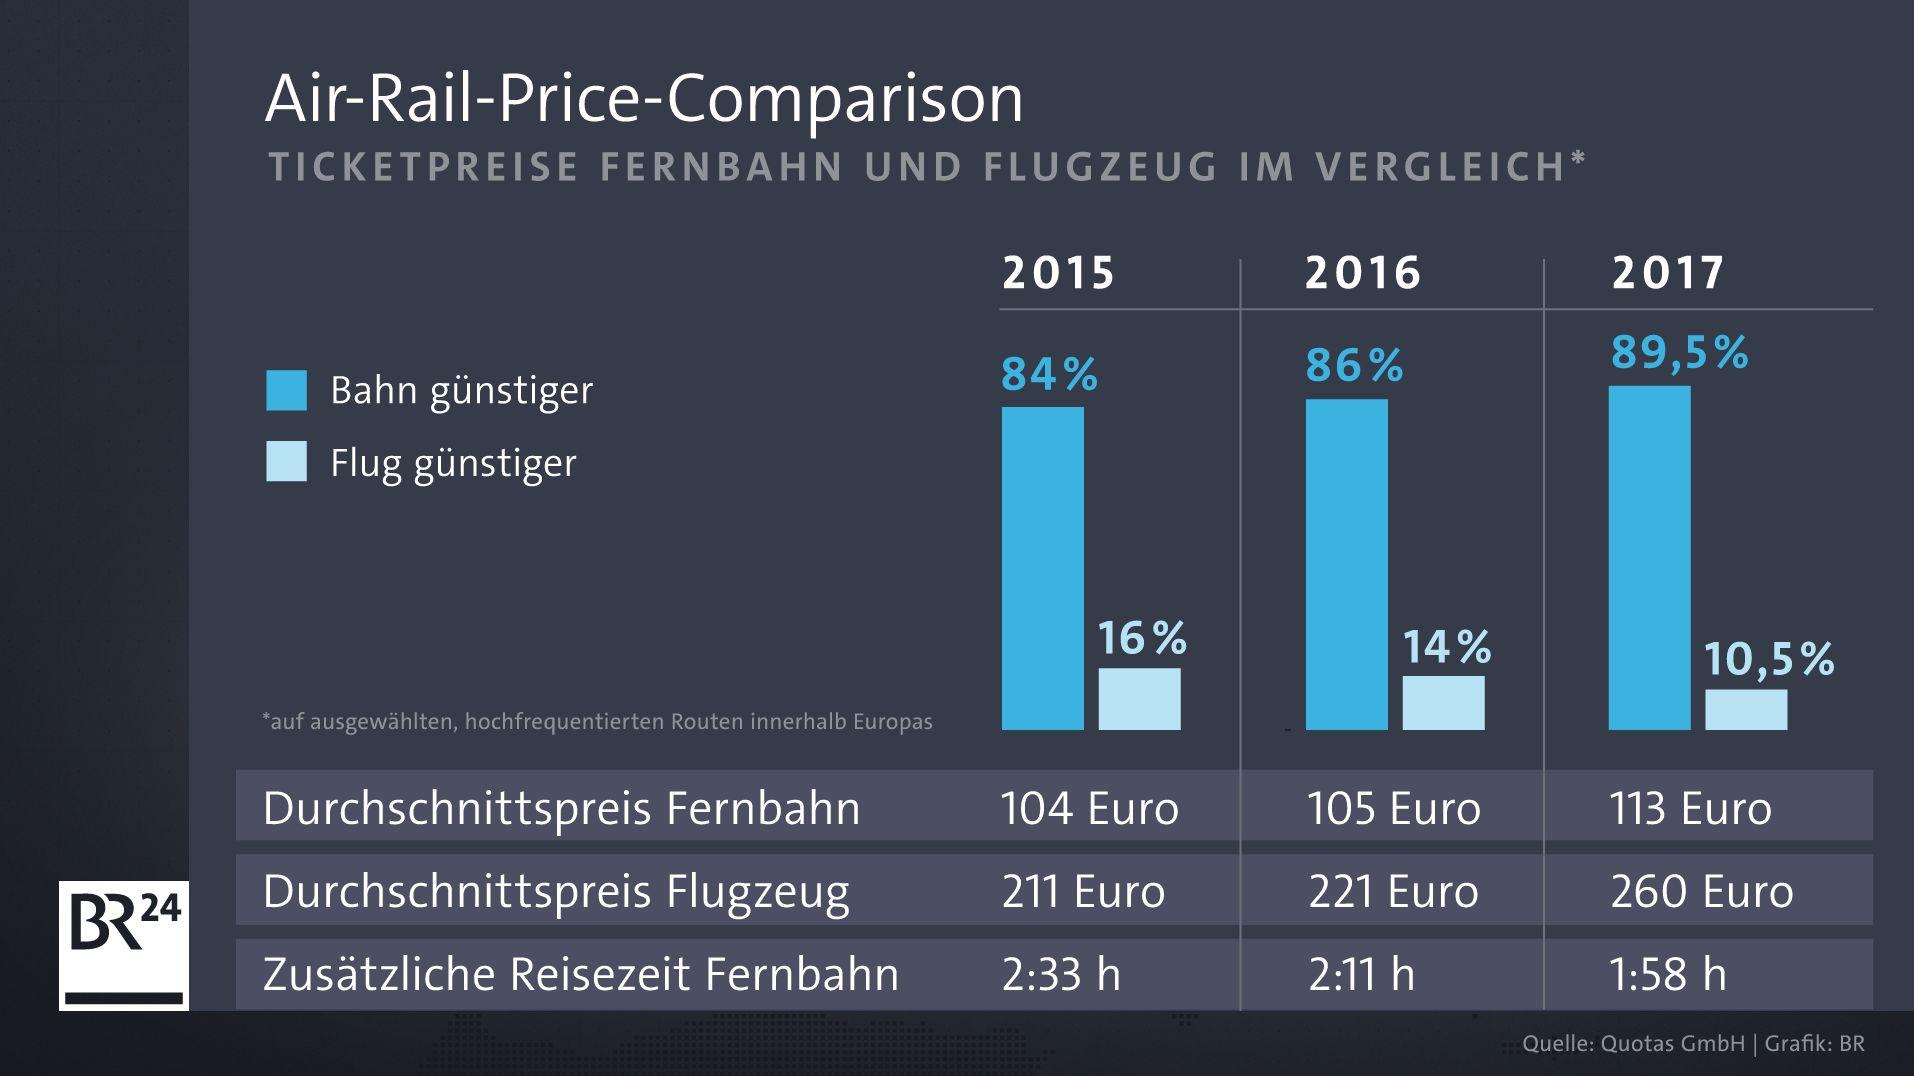 Infografik zur Air-Rail-Price-Comparison Studie